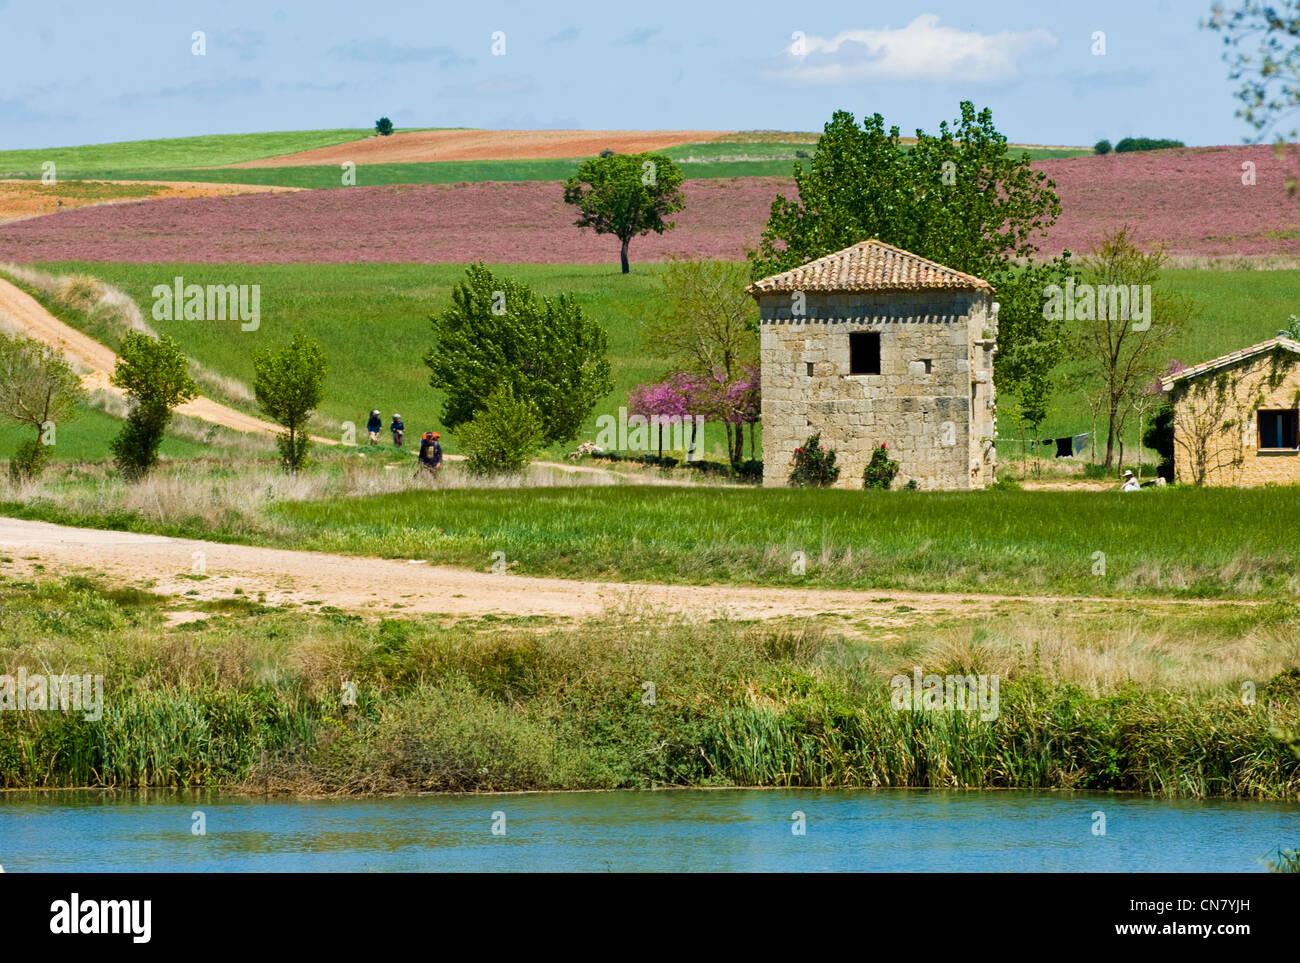 Spain, Castile and Leon, Puente Fitero, arrival on the San Nicolas hermitage - Stock Image